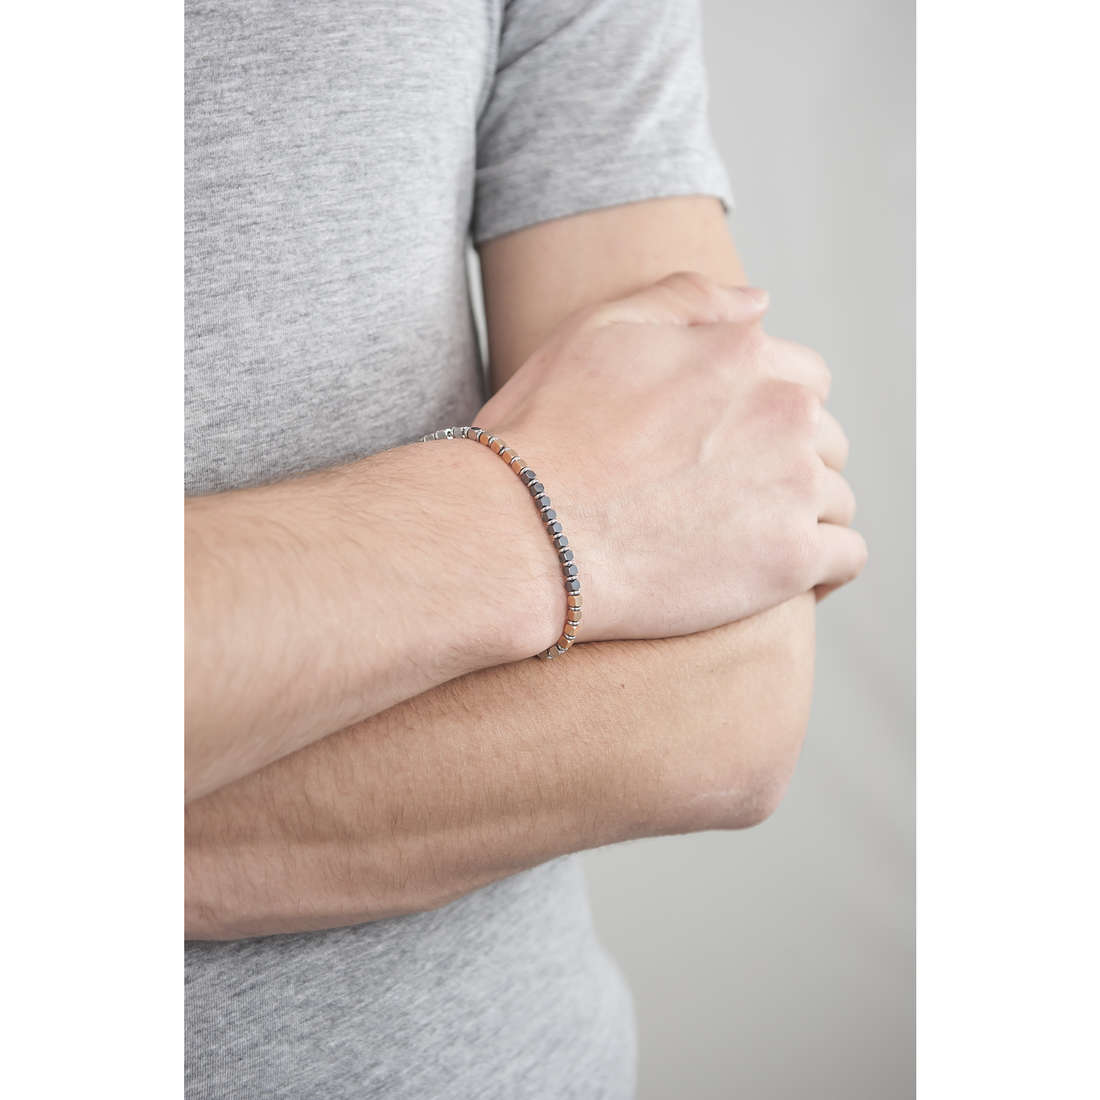 Morellato bracciali Ematite uomo SAHT05 indosso